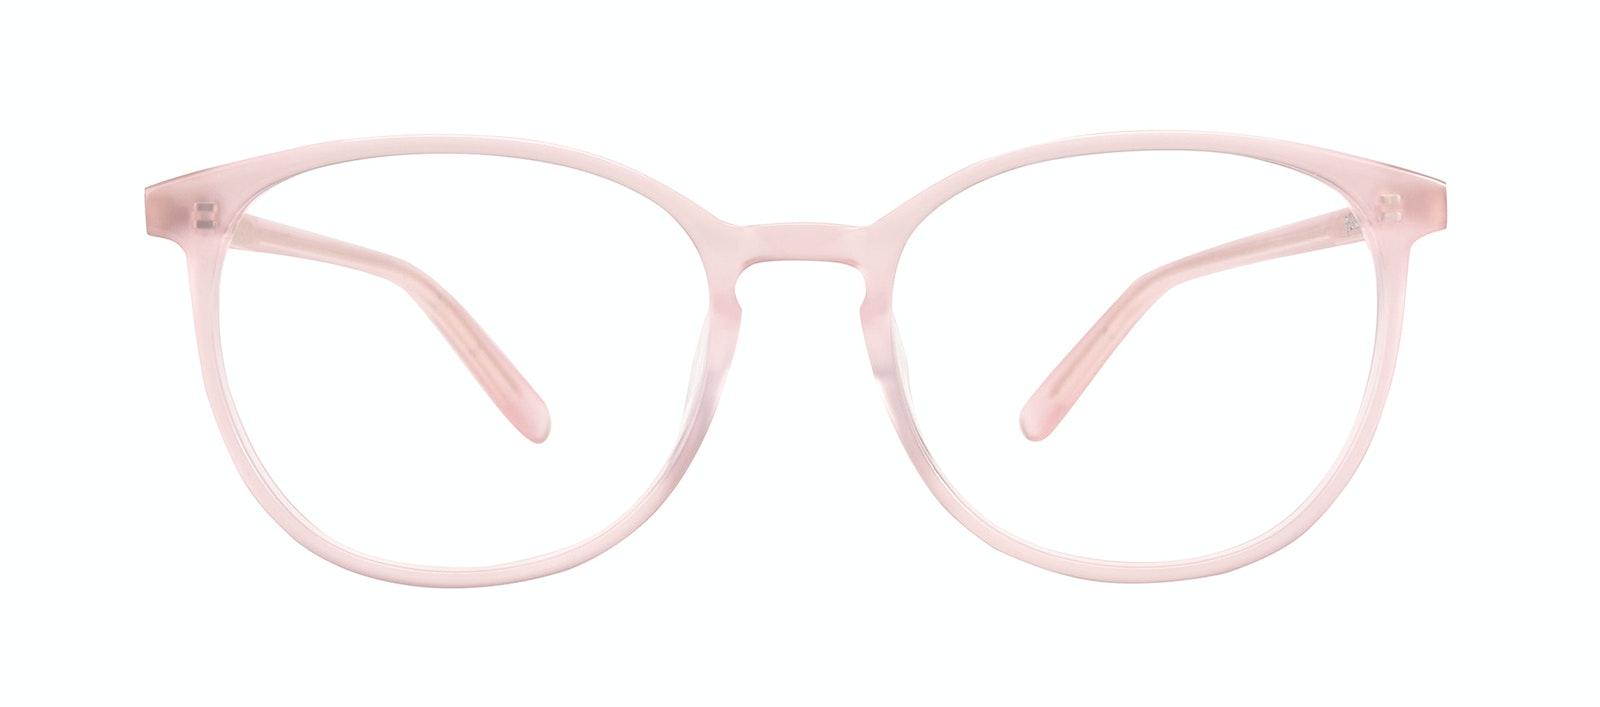 Affordable Fashion Glasses Round Eyeglasses Women Femme Libre Mila Front